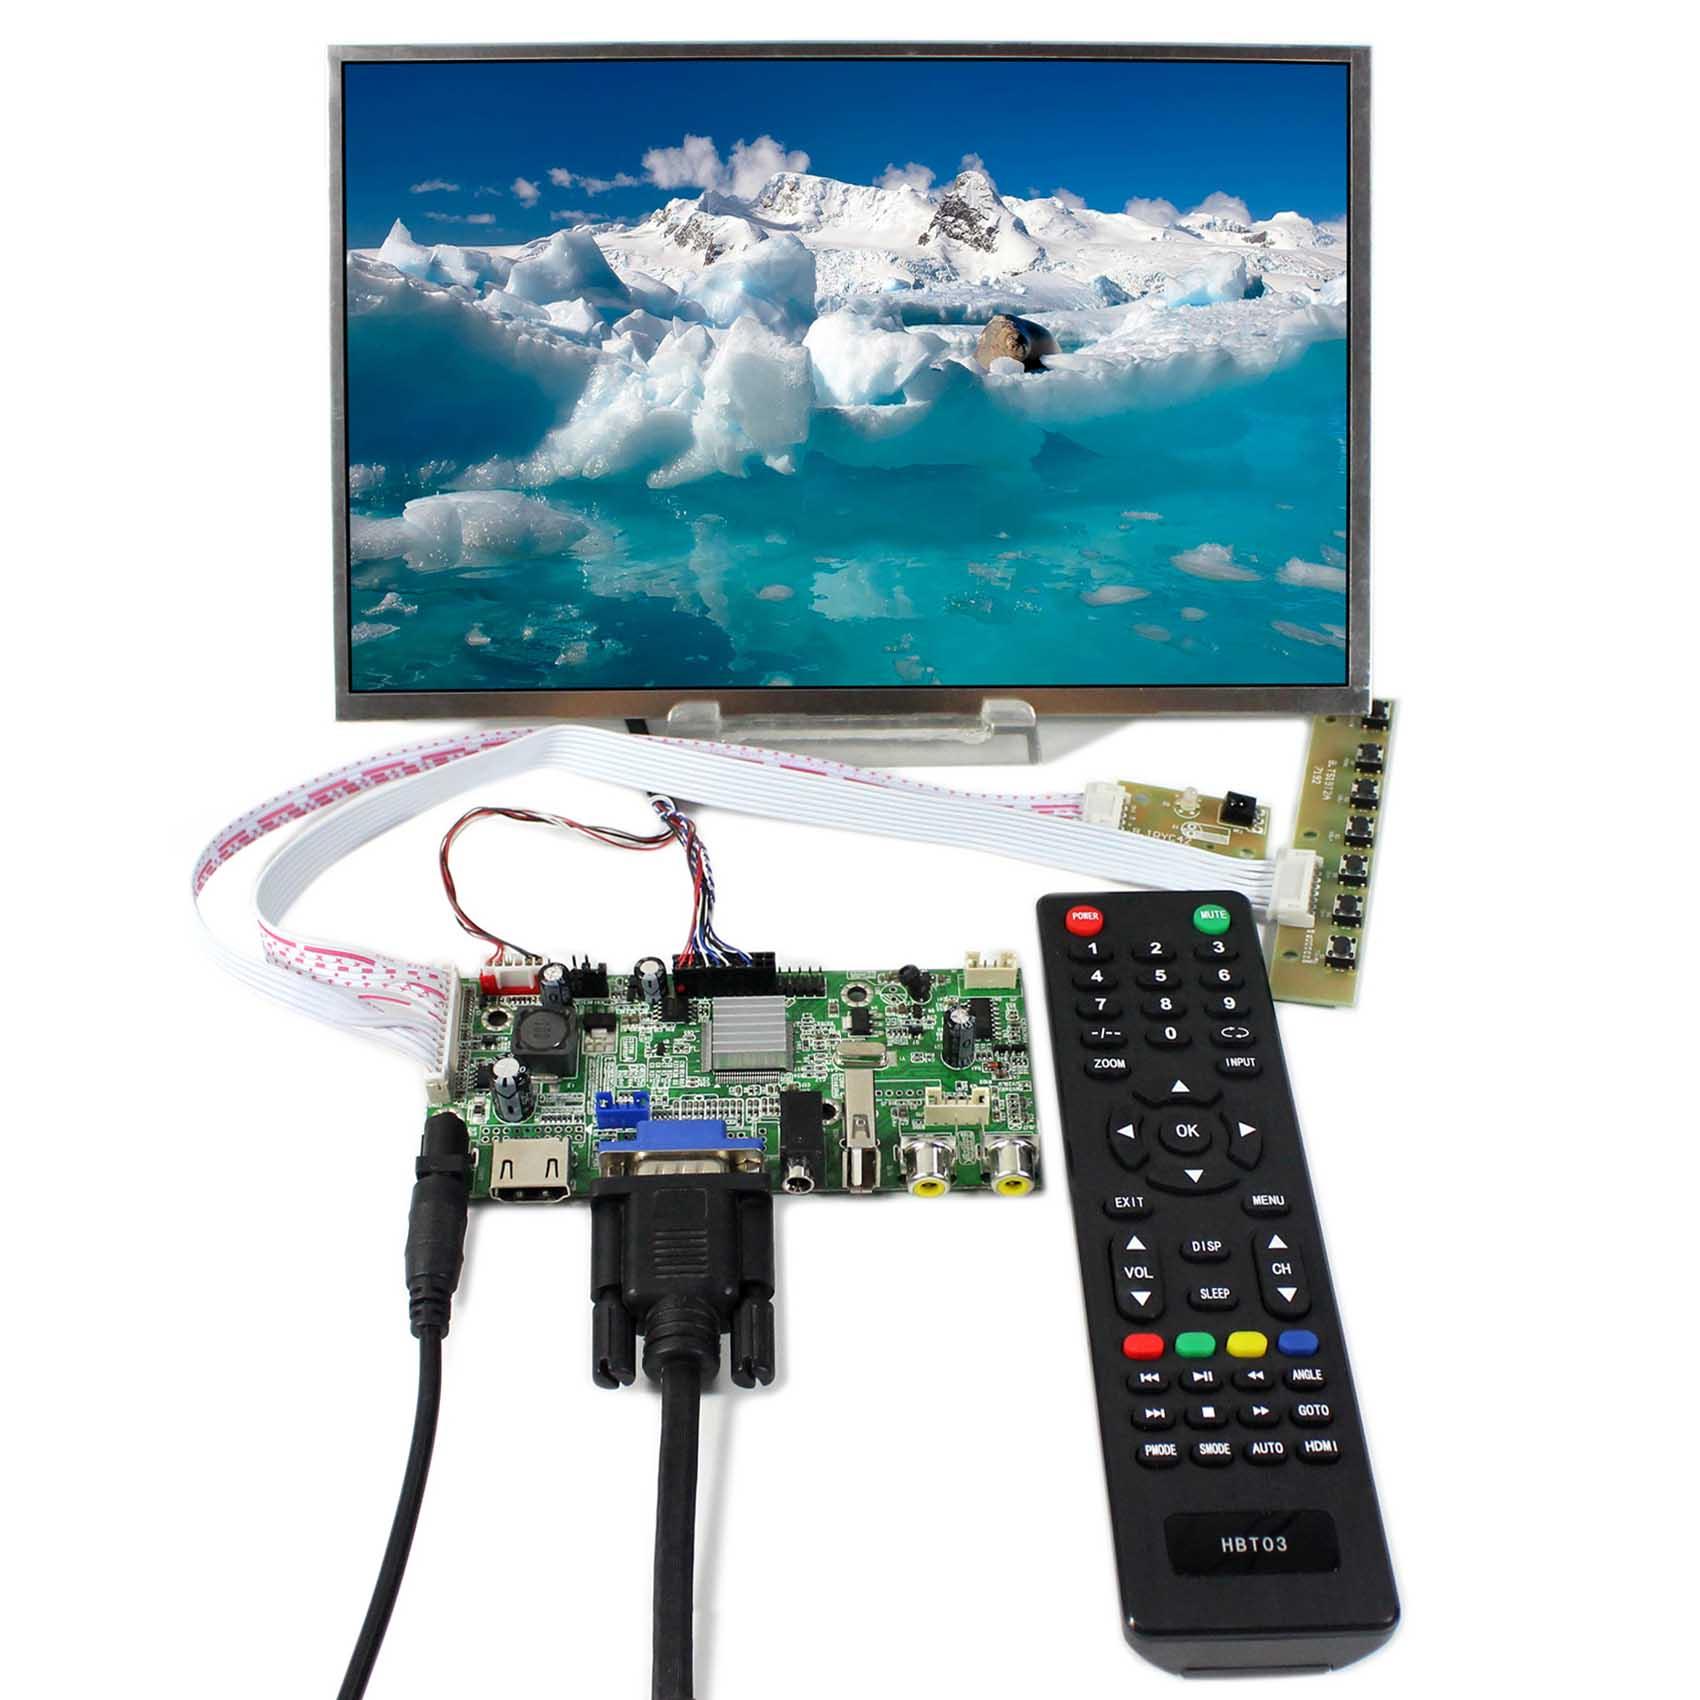 10.1inch LP101WX1 B101EW05 1280x800 LCD Screen With HDMI VGA AV Audio USB LCD Controller Board VS-V59AV-V1 hdmi vga av lcd controller board for 14 1inch 15 4inch 1280x800 ltn141at01 b141ew02 b154ew02 lp154wx4 lcd screen